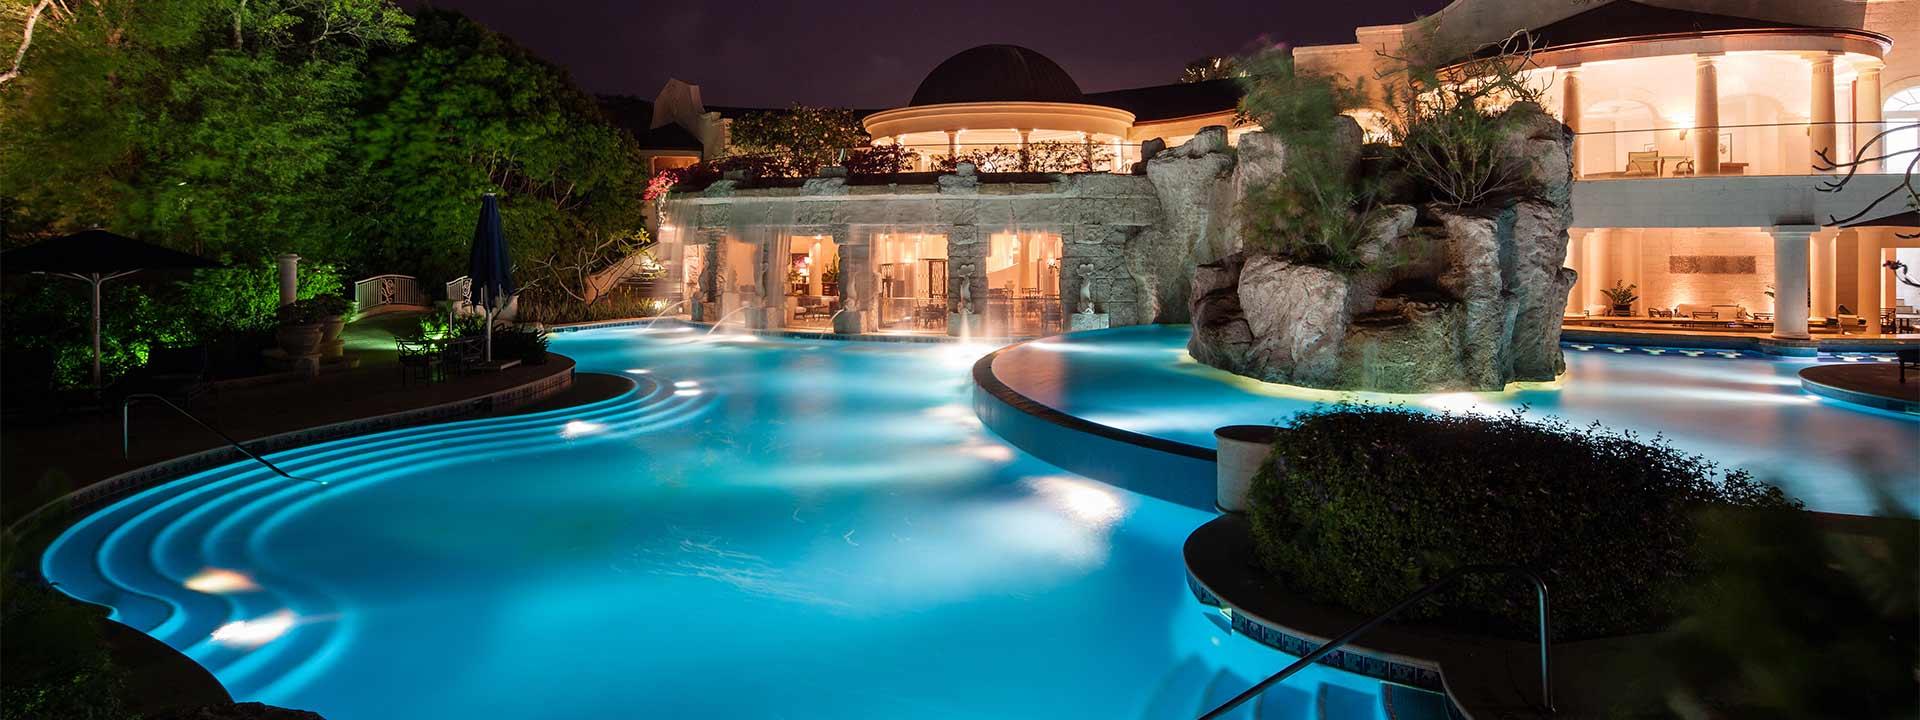 A look at Sandy Lane Resort in Barbados.